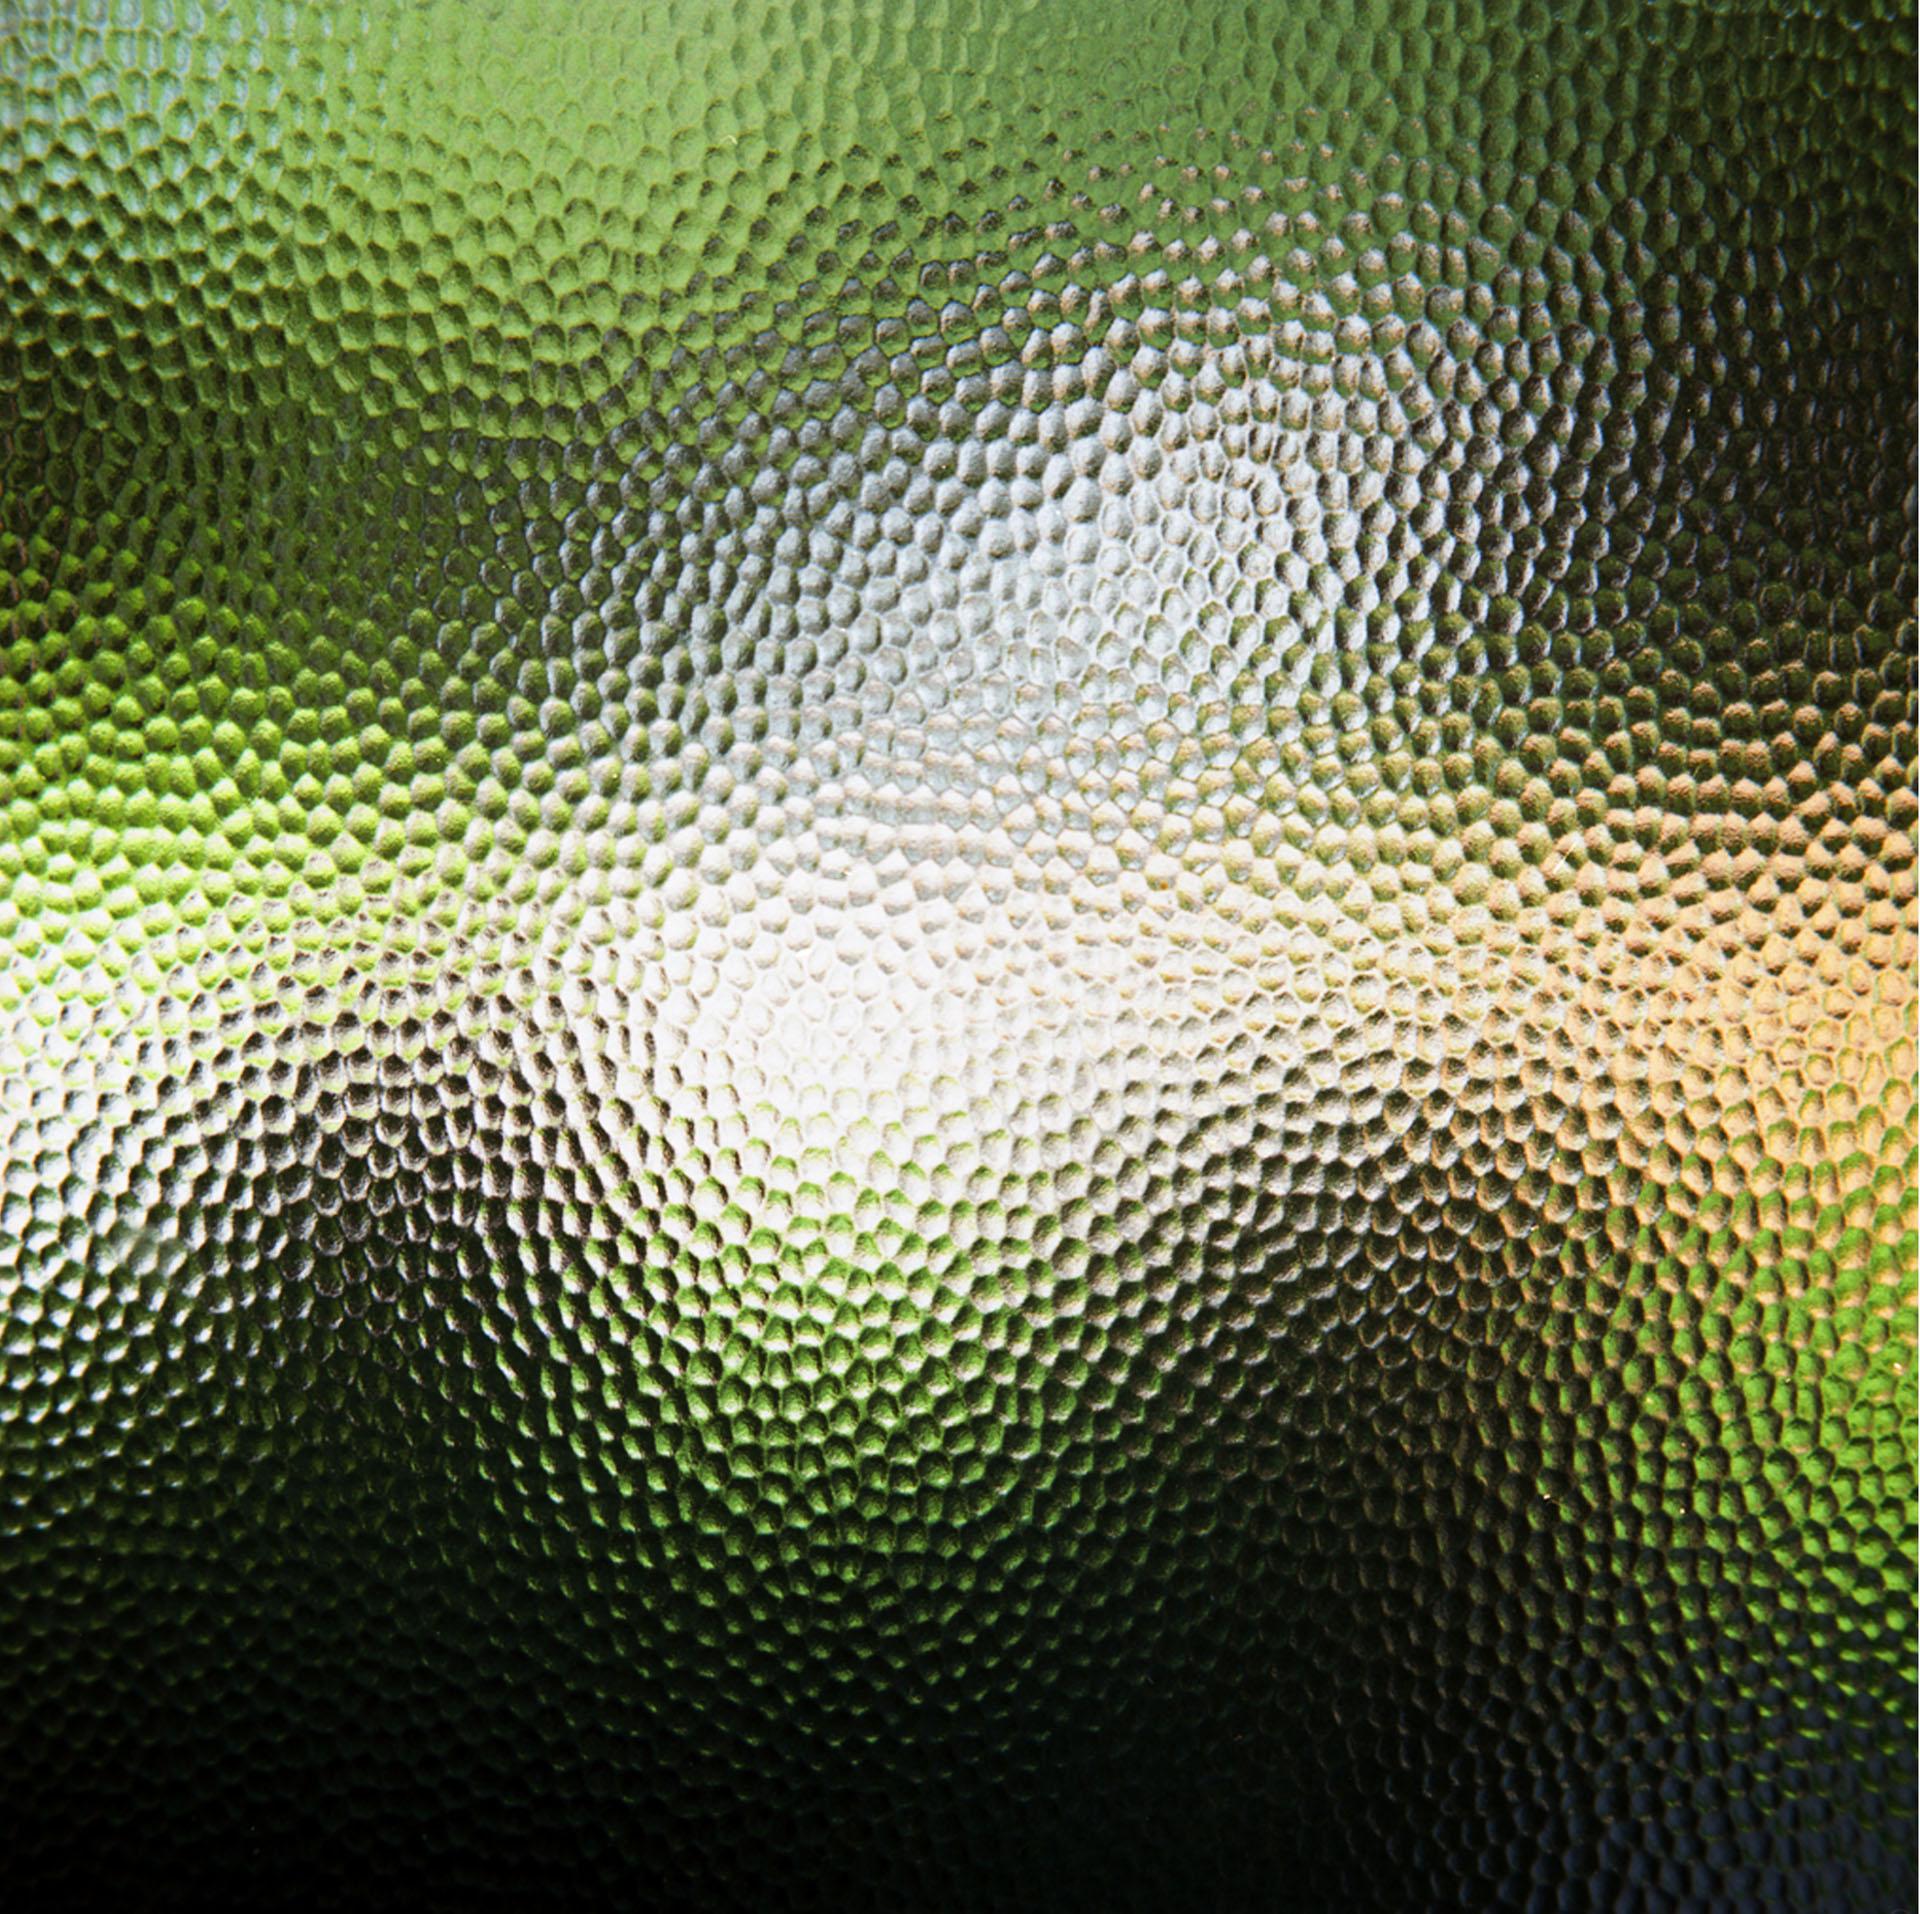 Sarah Krawcheck, Window